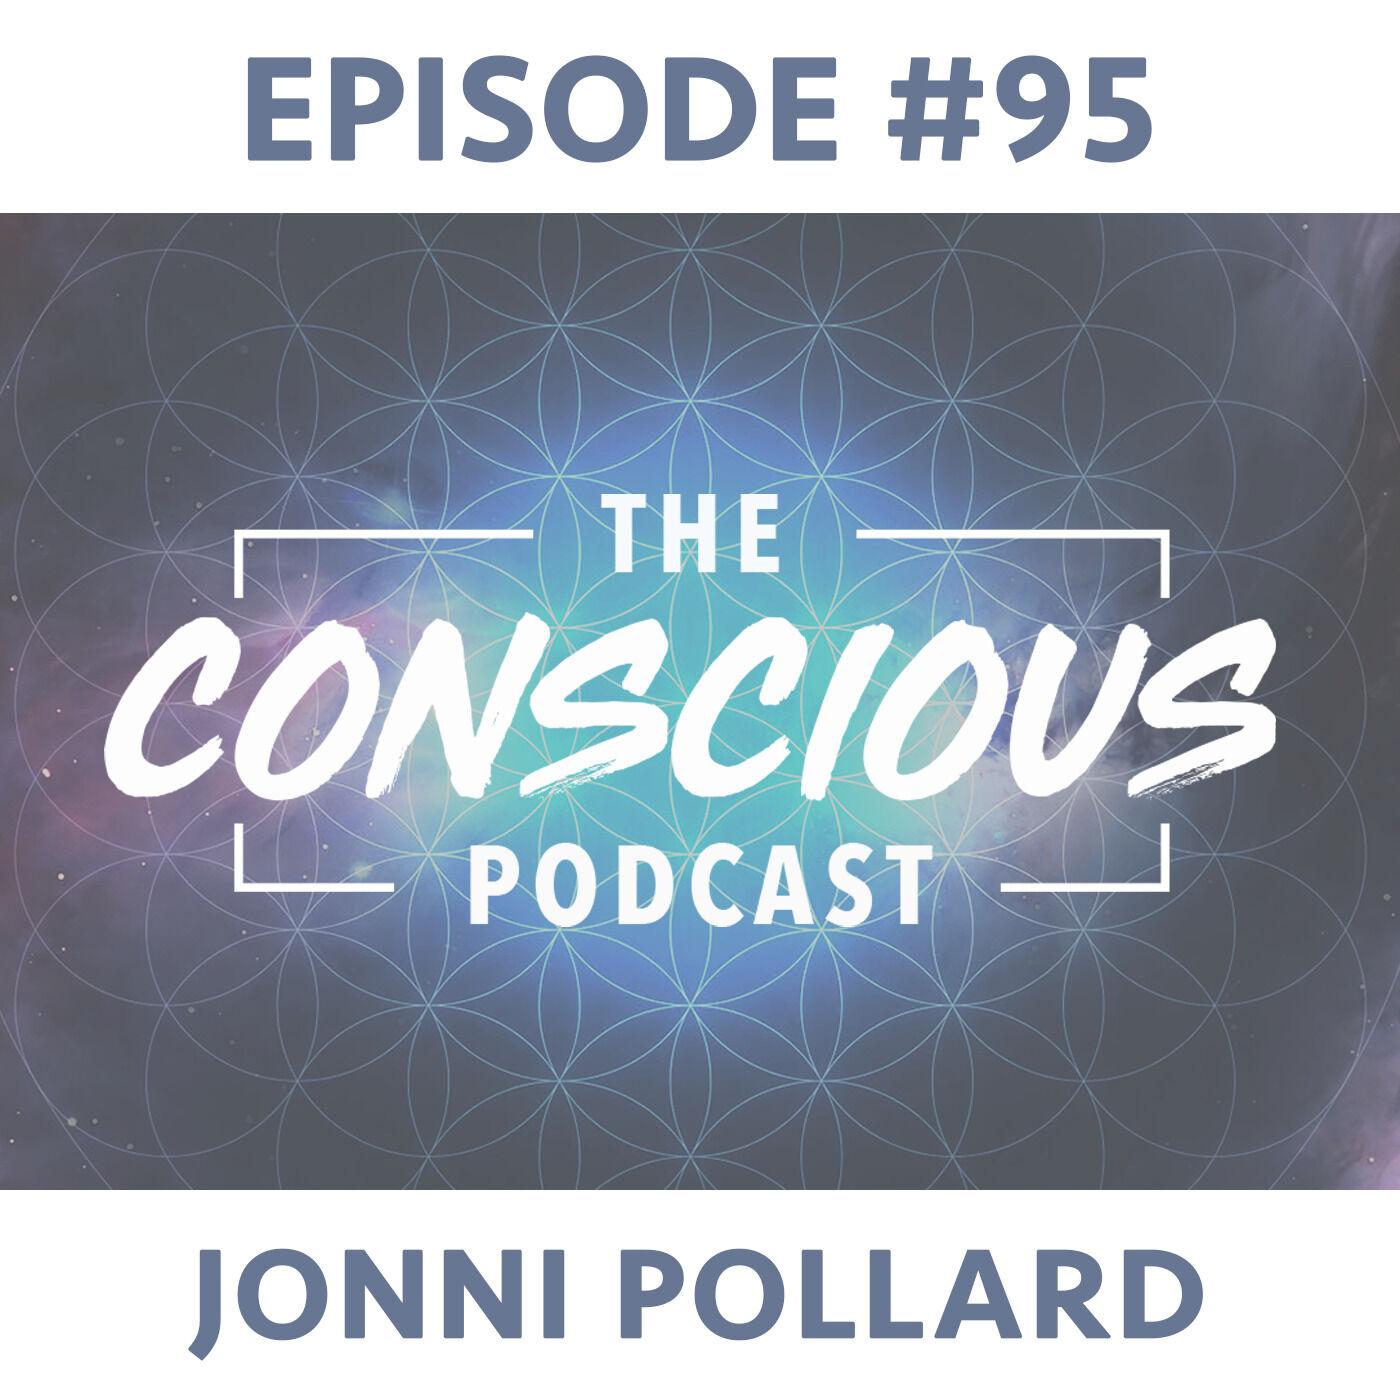 #95 - Jonni Pollard on Belonging, Awakening & Becoming Your Truth.